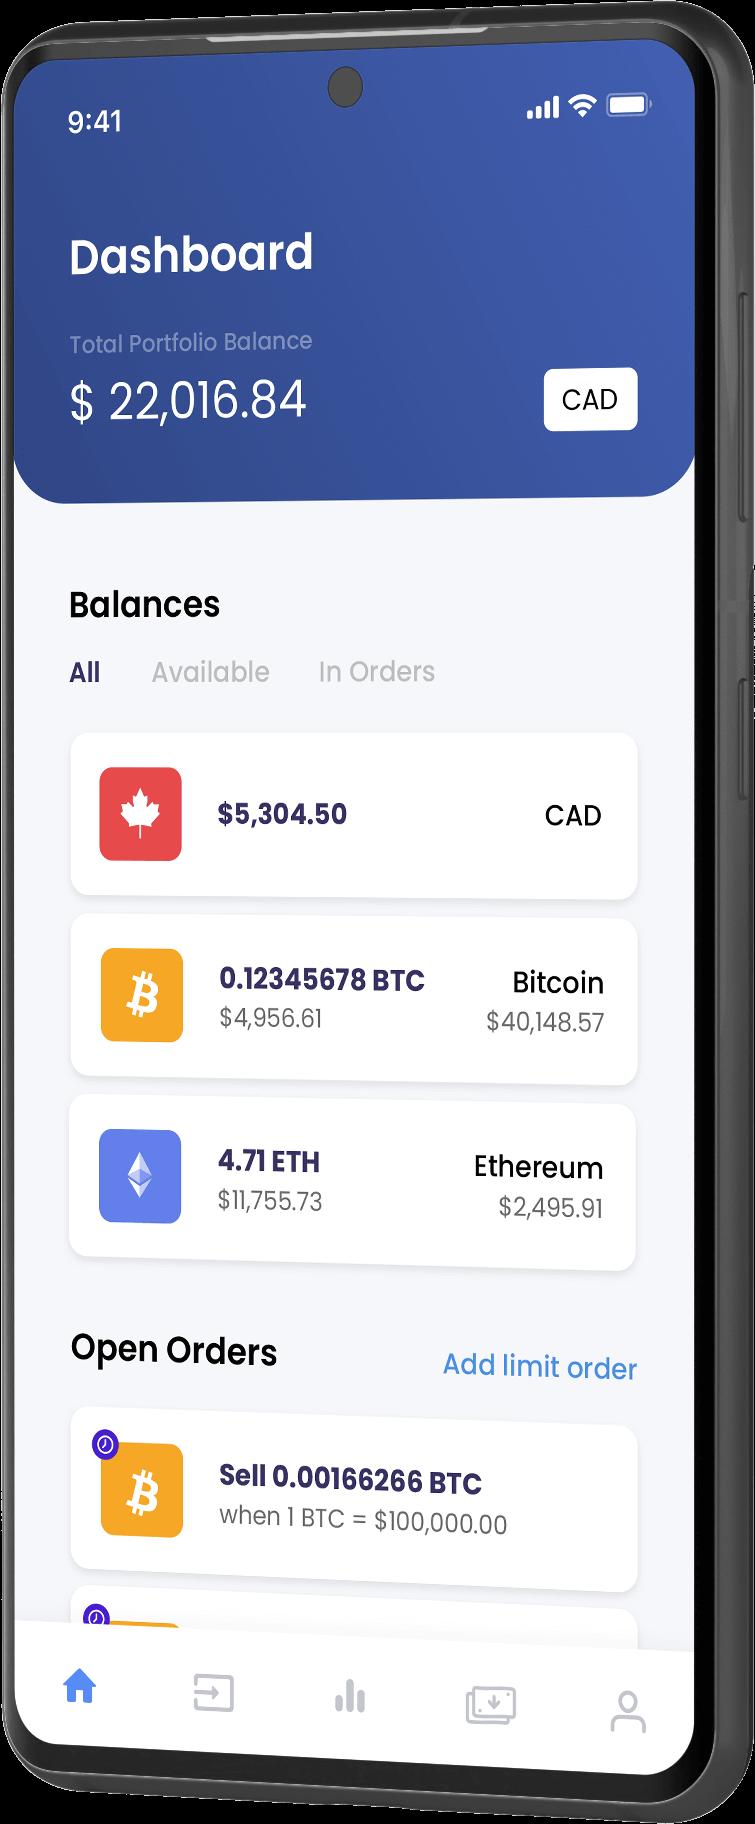 Netcoins Mobile App - Dashboard